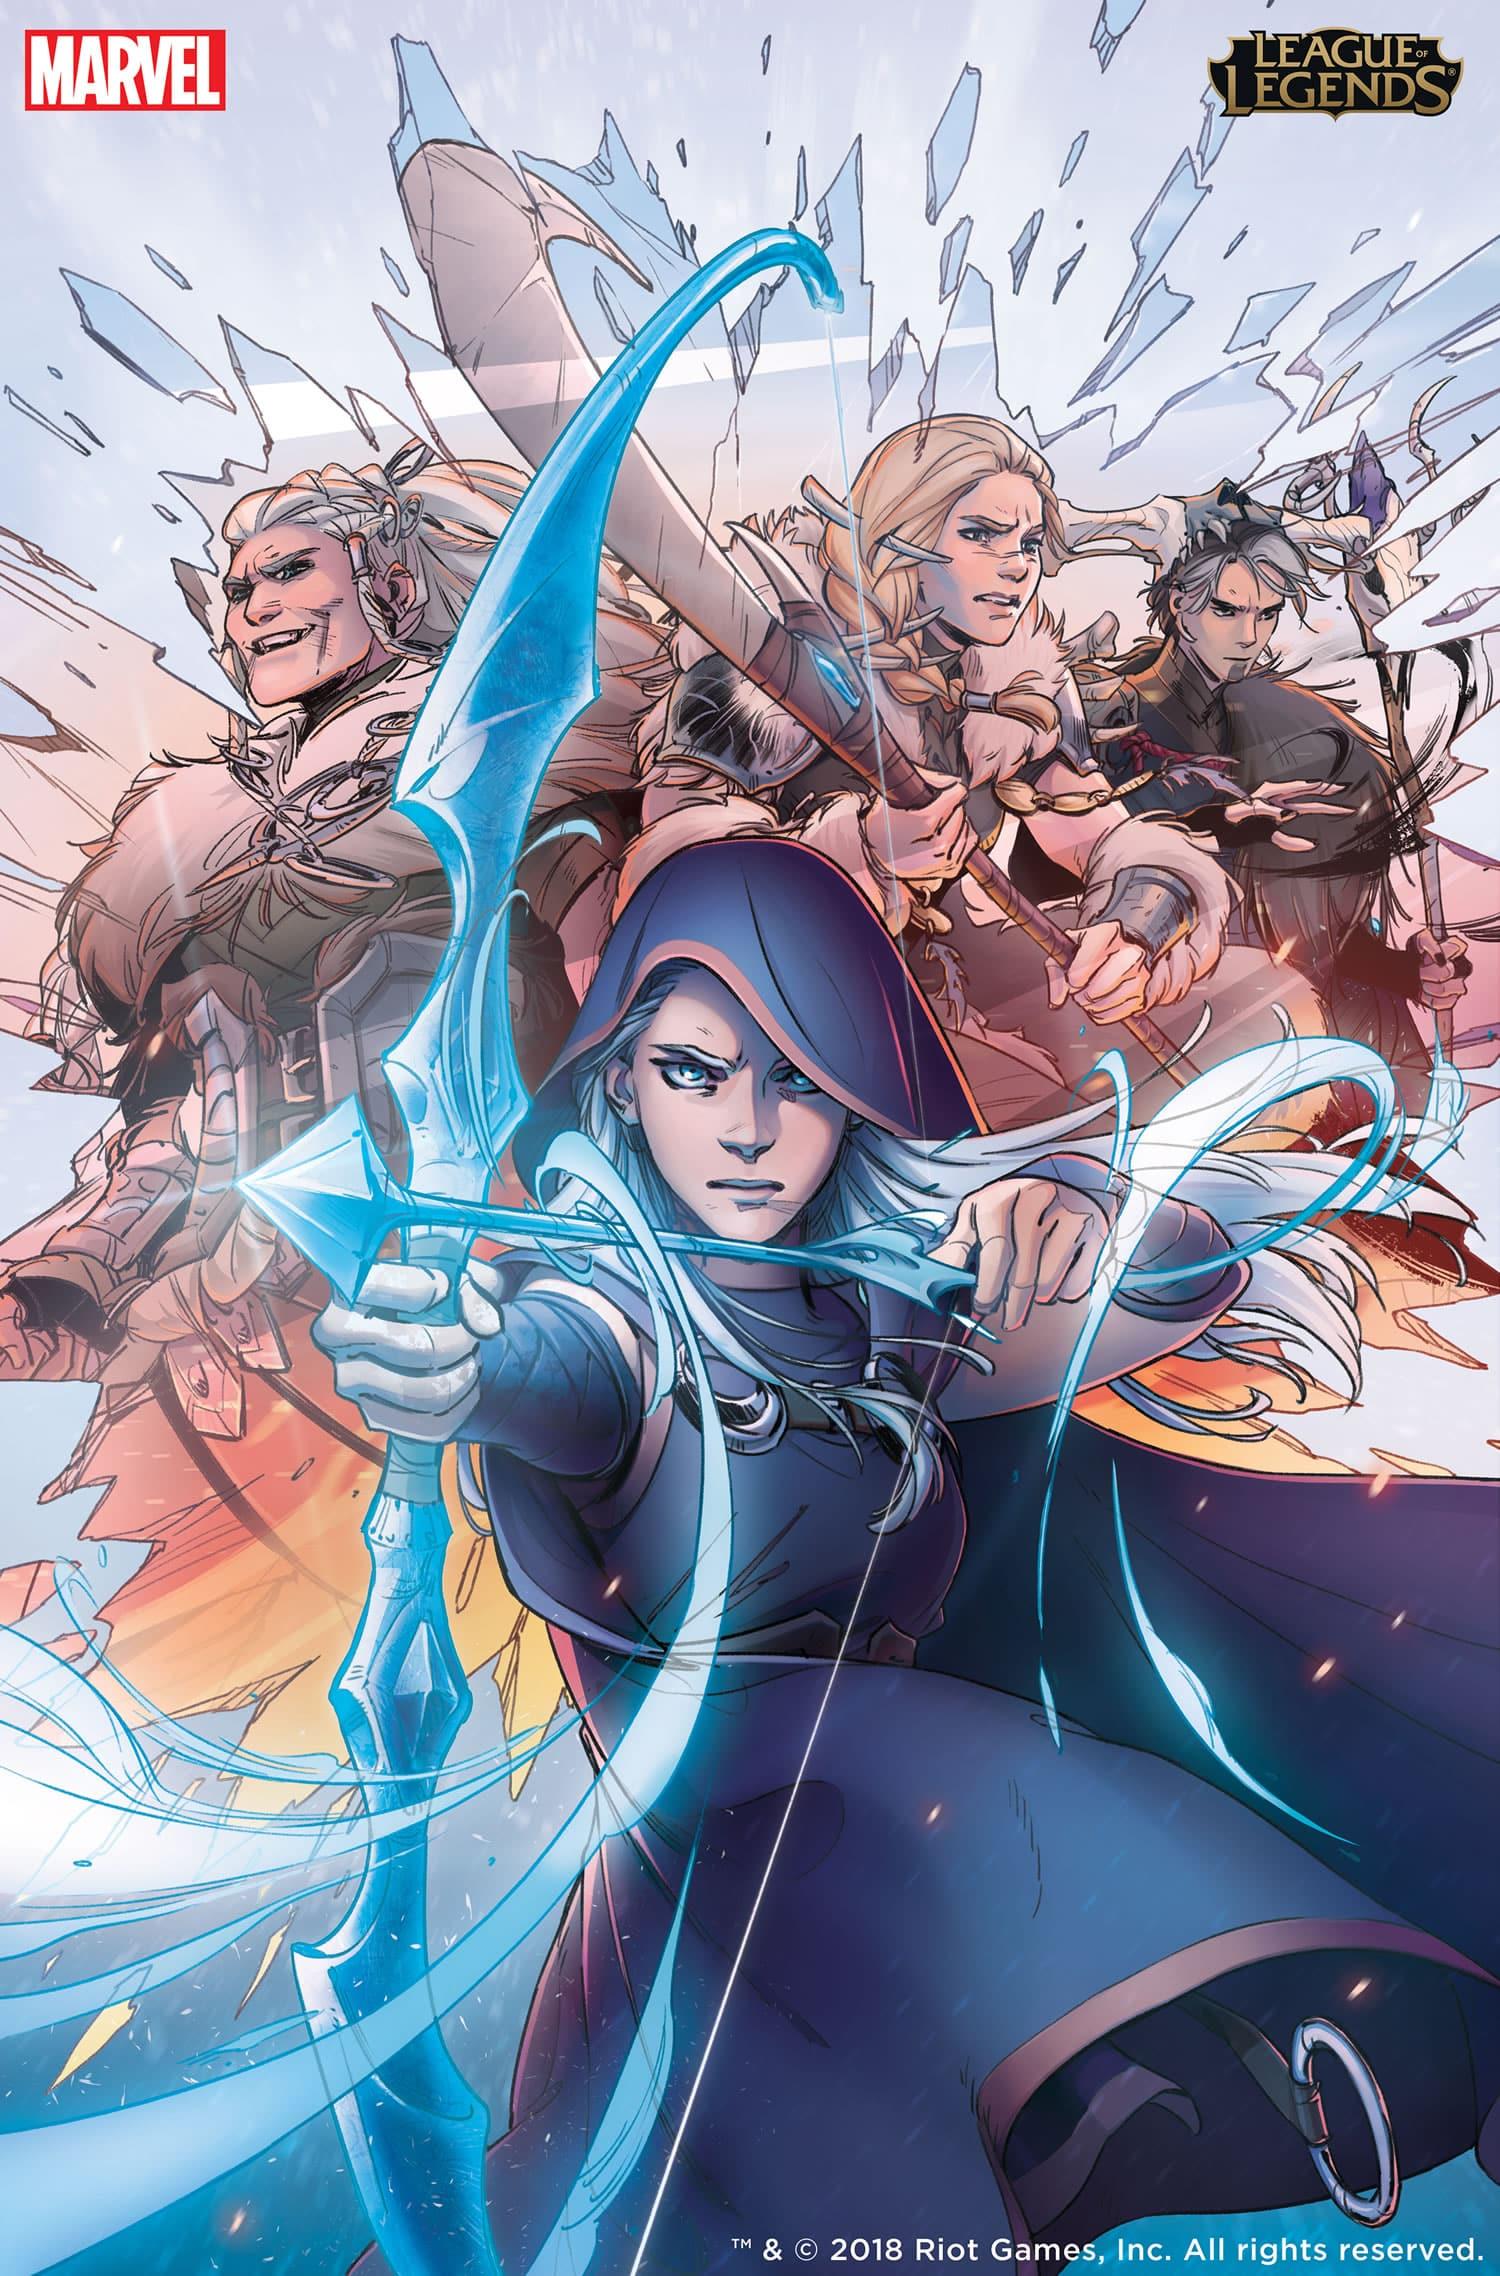 Marvel publicará cómics y novelas de League of Legends